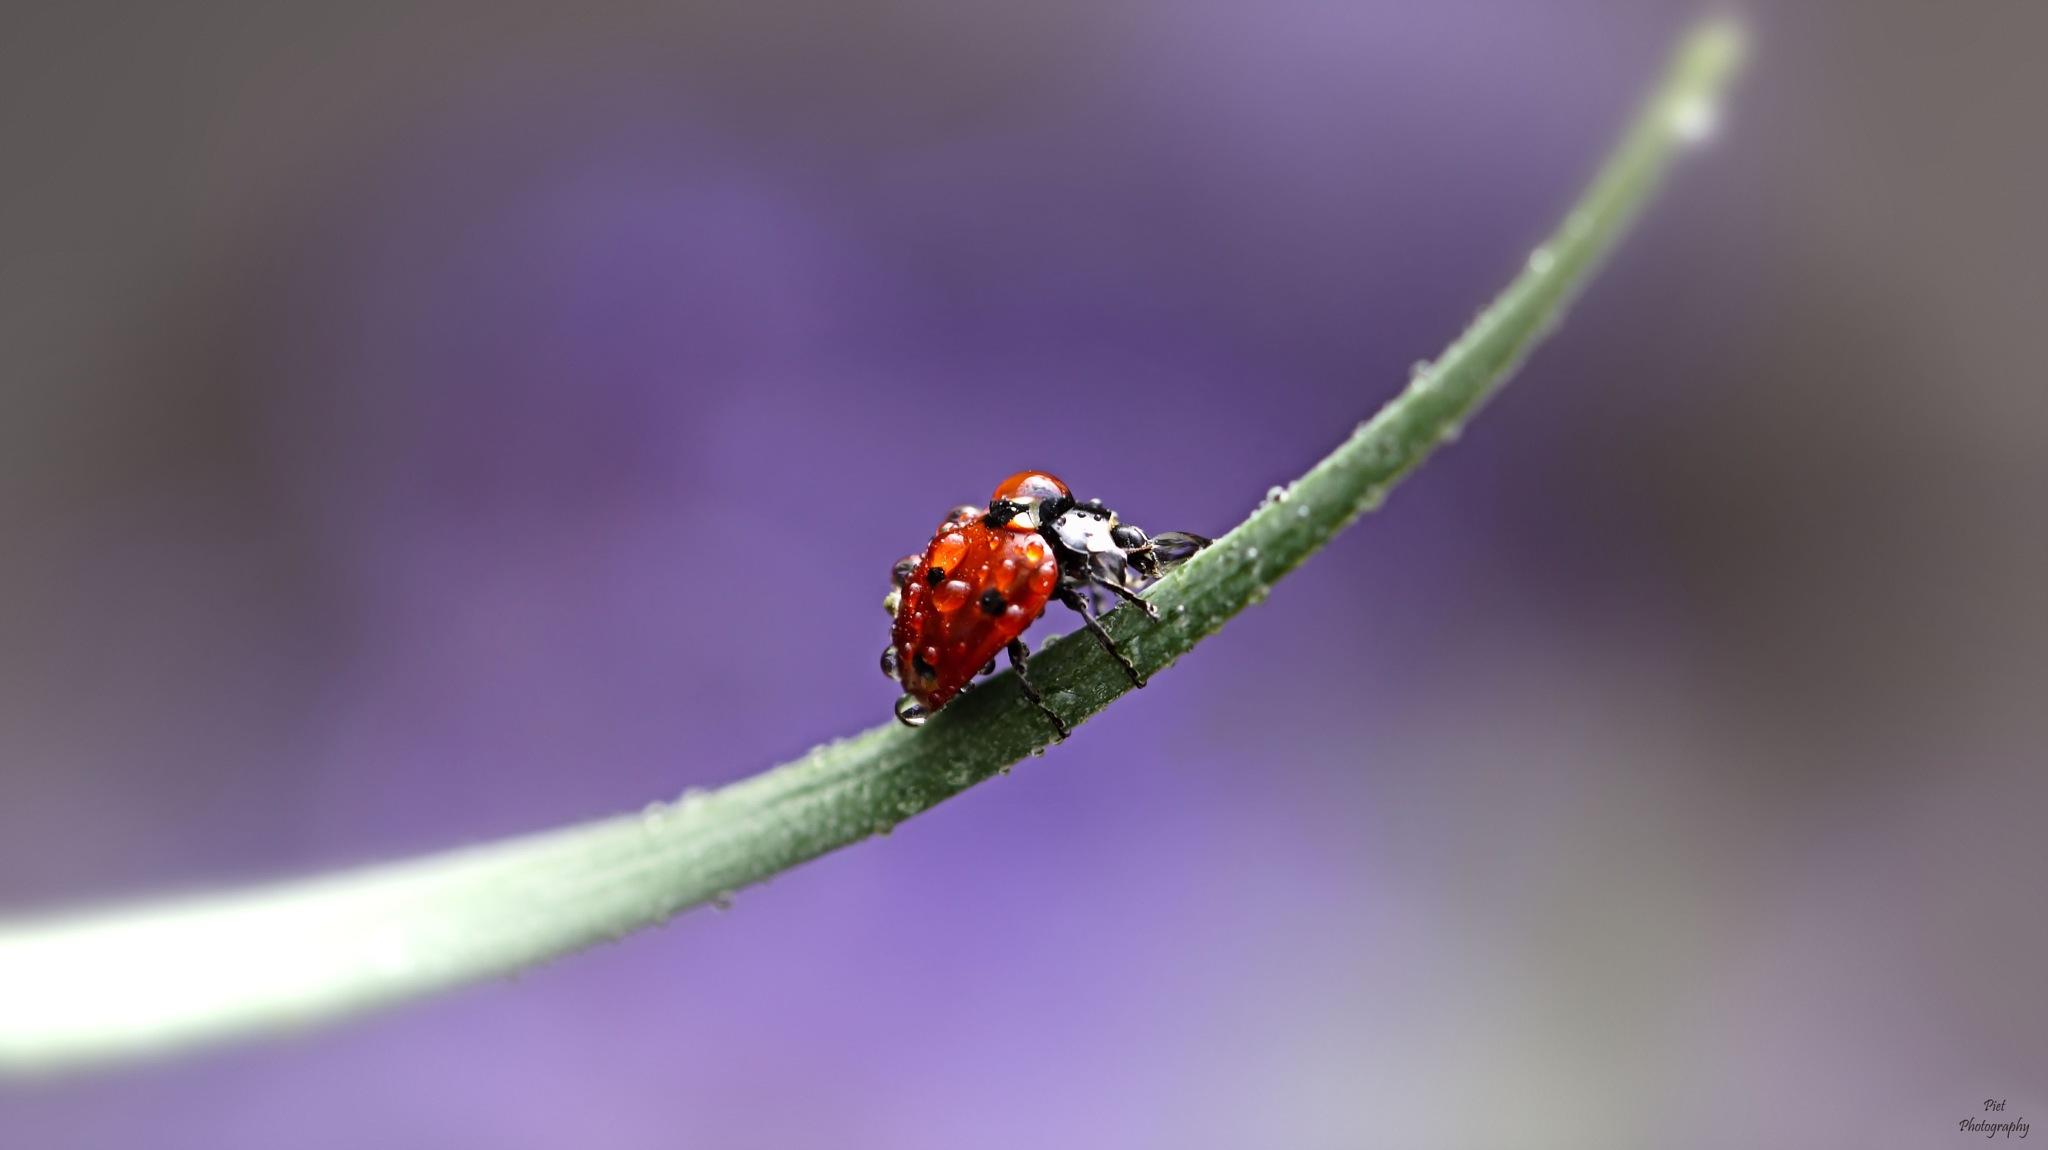 Ladybug After Rain.... by PWaardenburg